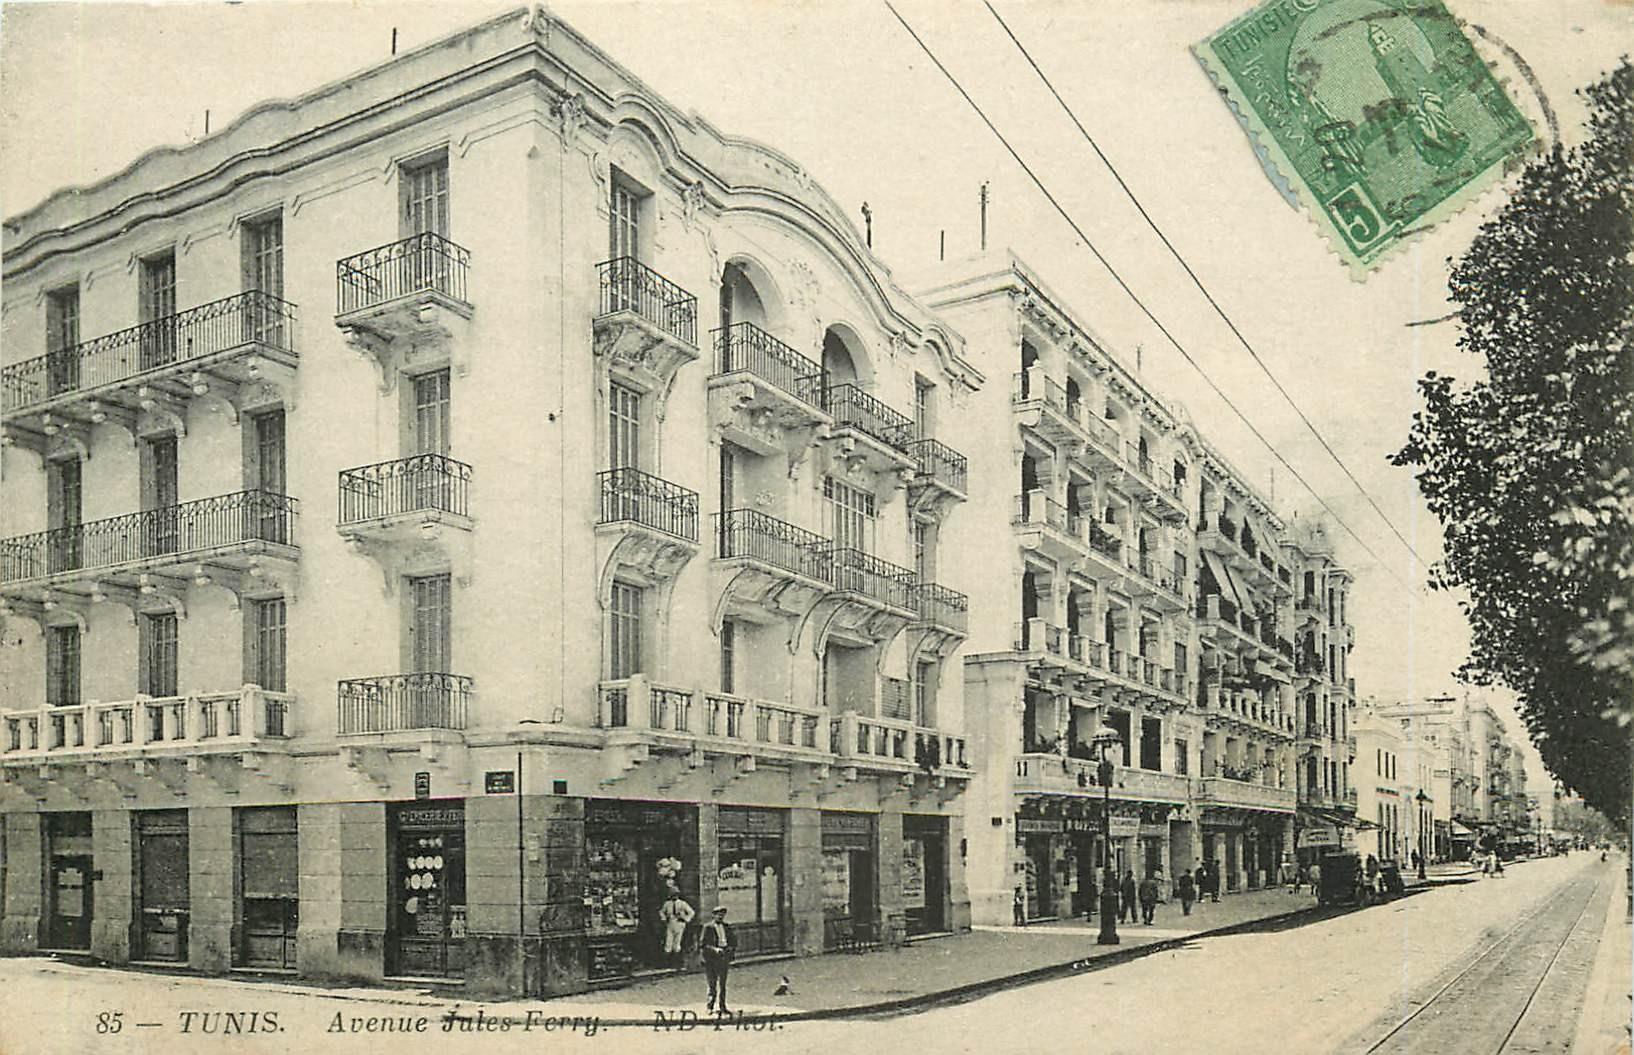 WW TUNIS. Avenue Jules Ferry 1914 en Tunisie